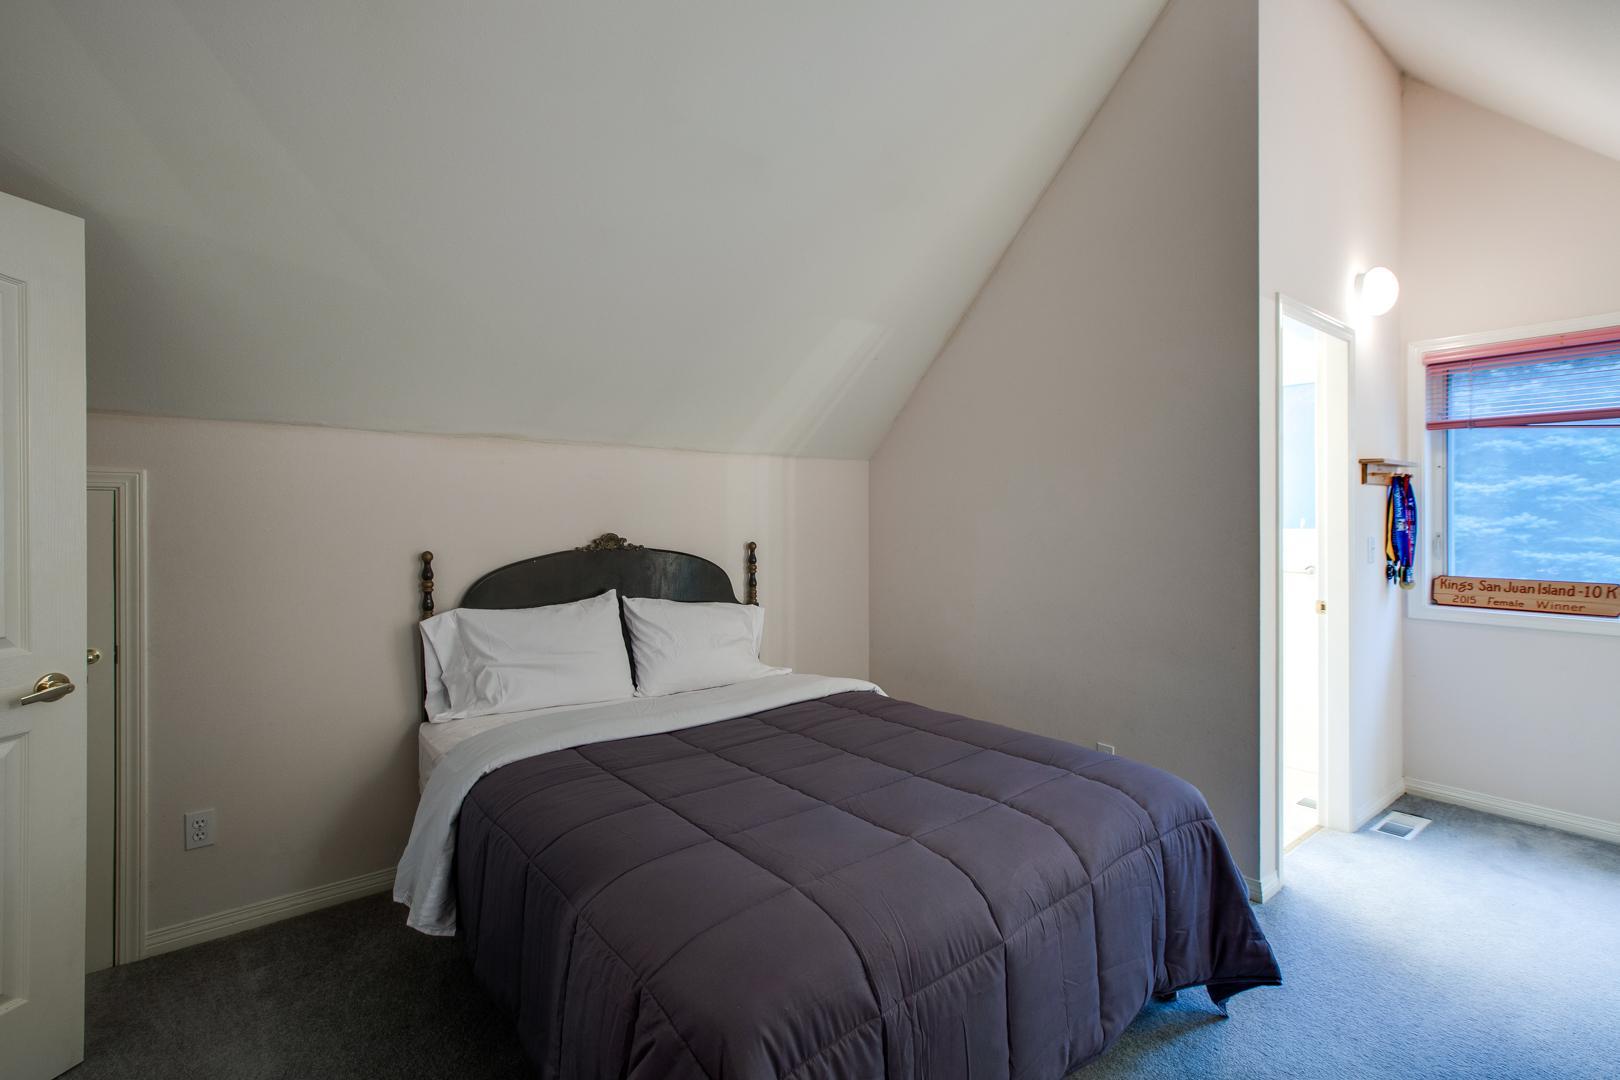 Apartment Mt  Baker Lodging Cabin  58     FIREPLACE  DISHWASHER  WIFI  SLEEPS 6  photo 4276974